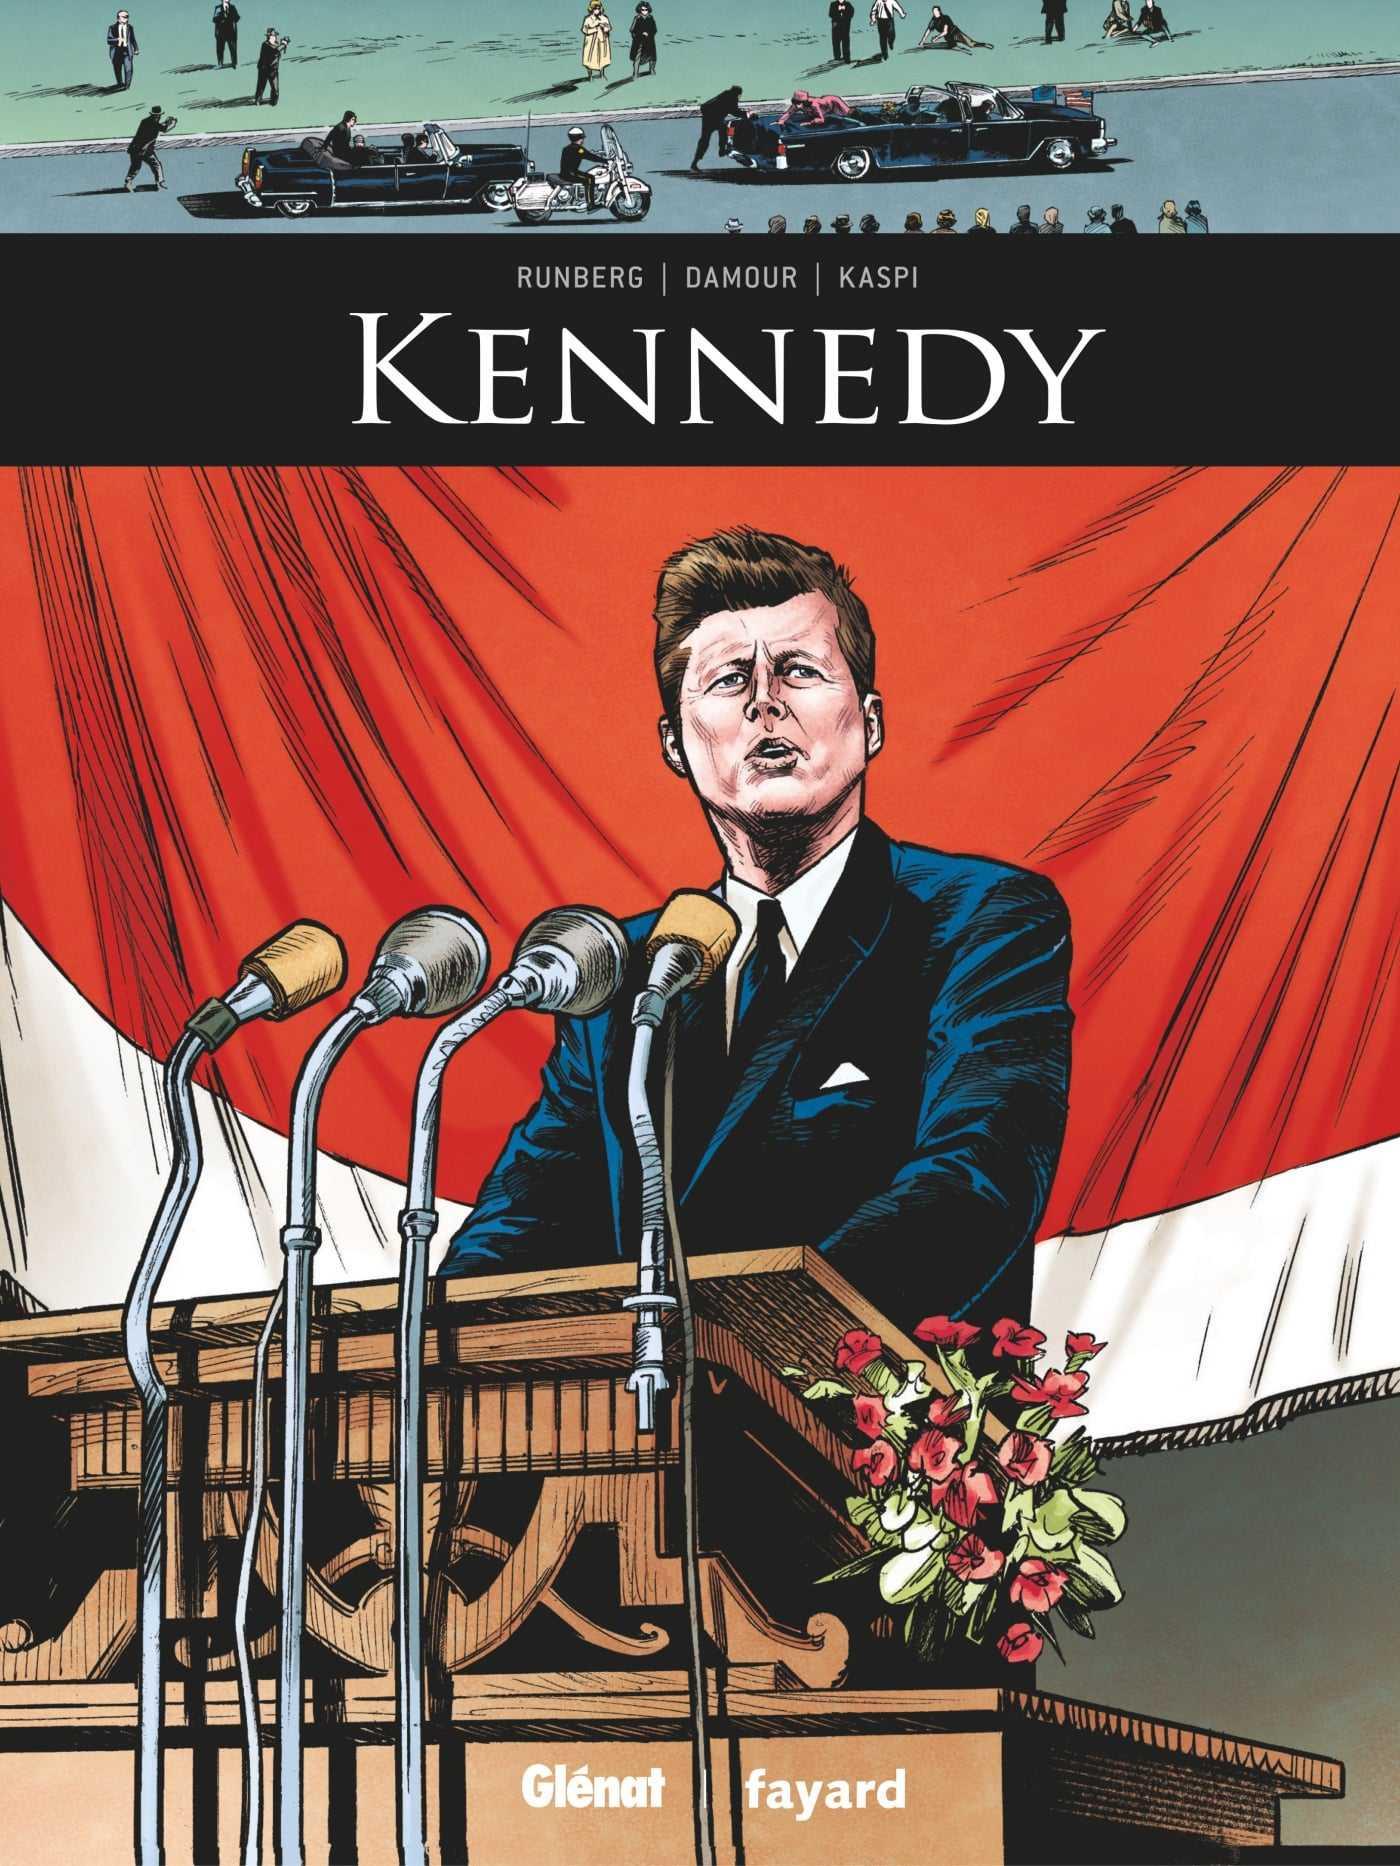 John Kennedy et Mao Zedong, figures de proue du XXe siècle